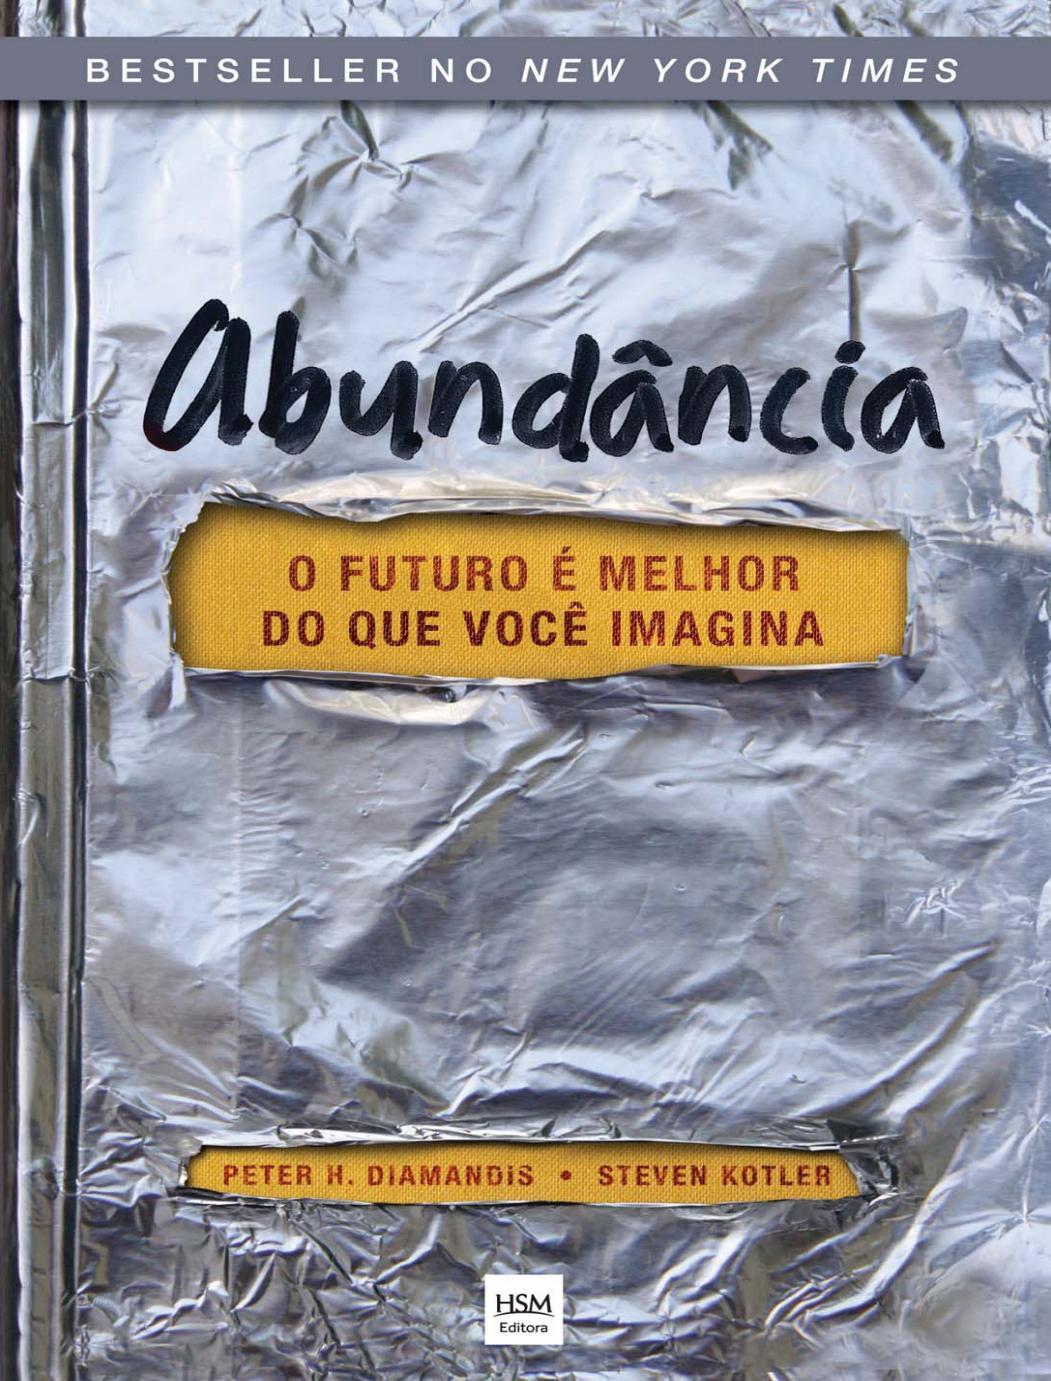 57eabbb12c0 Abundancia  O futuro e melhor - Peter H. Diamandis by Luan Benavenuto -  issuu